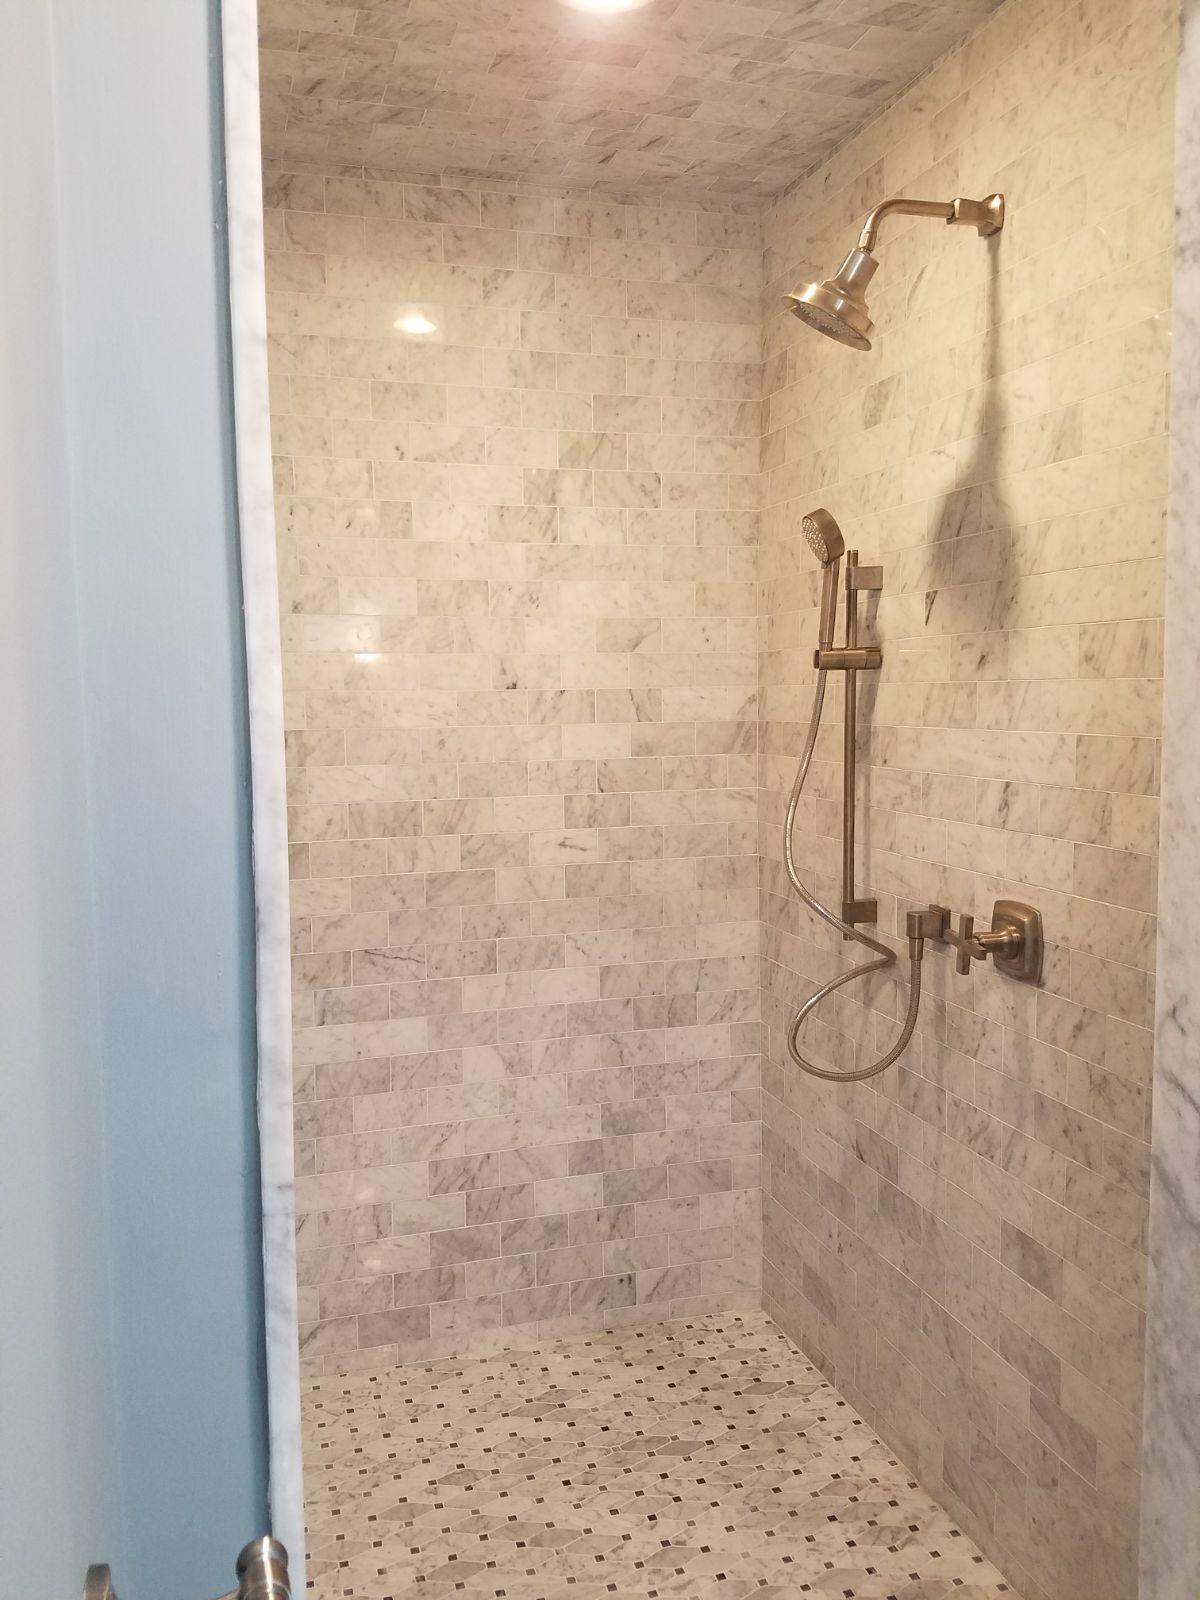 Bathroom 8.36.11 PM (1).jpeg